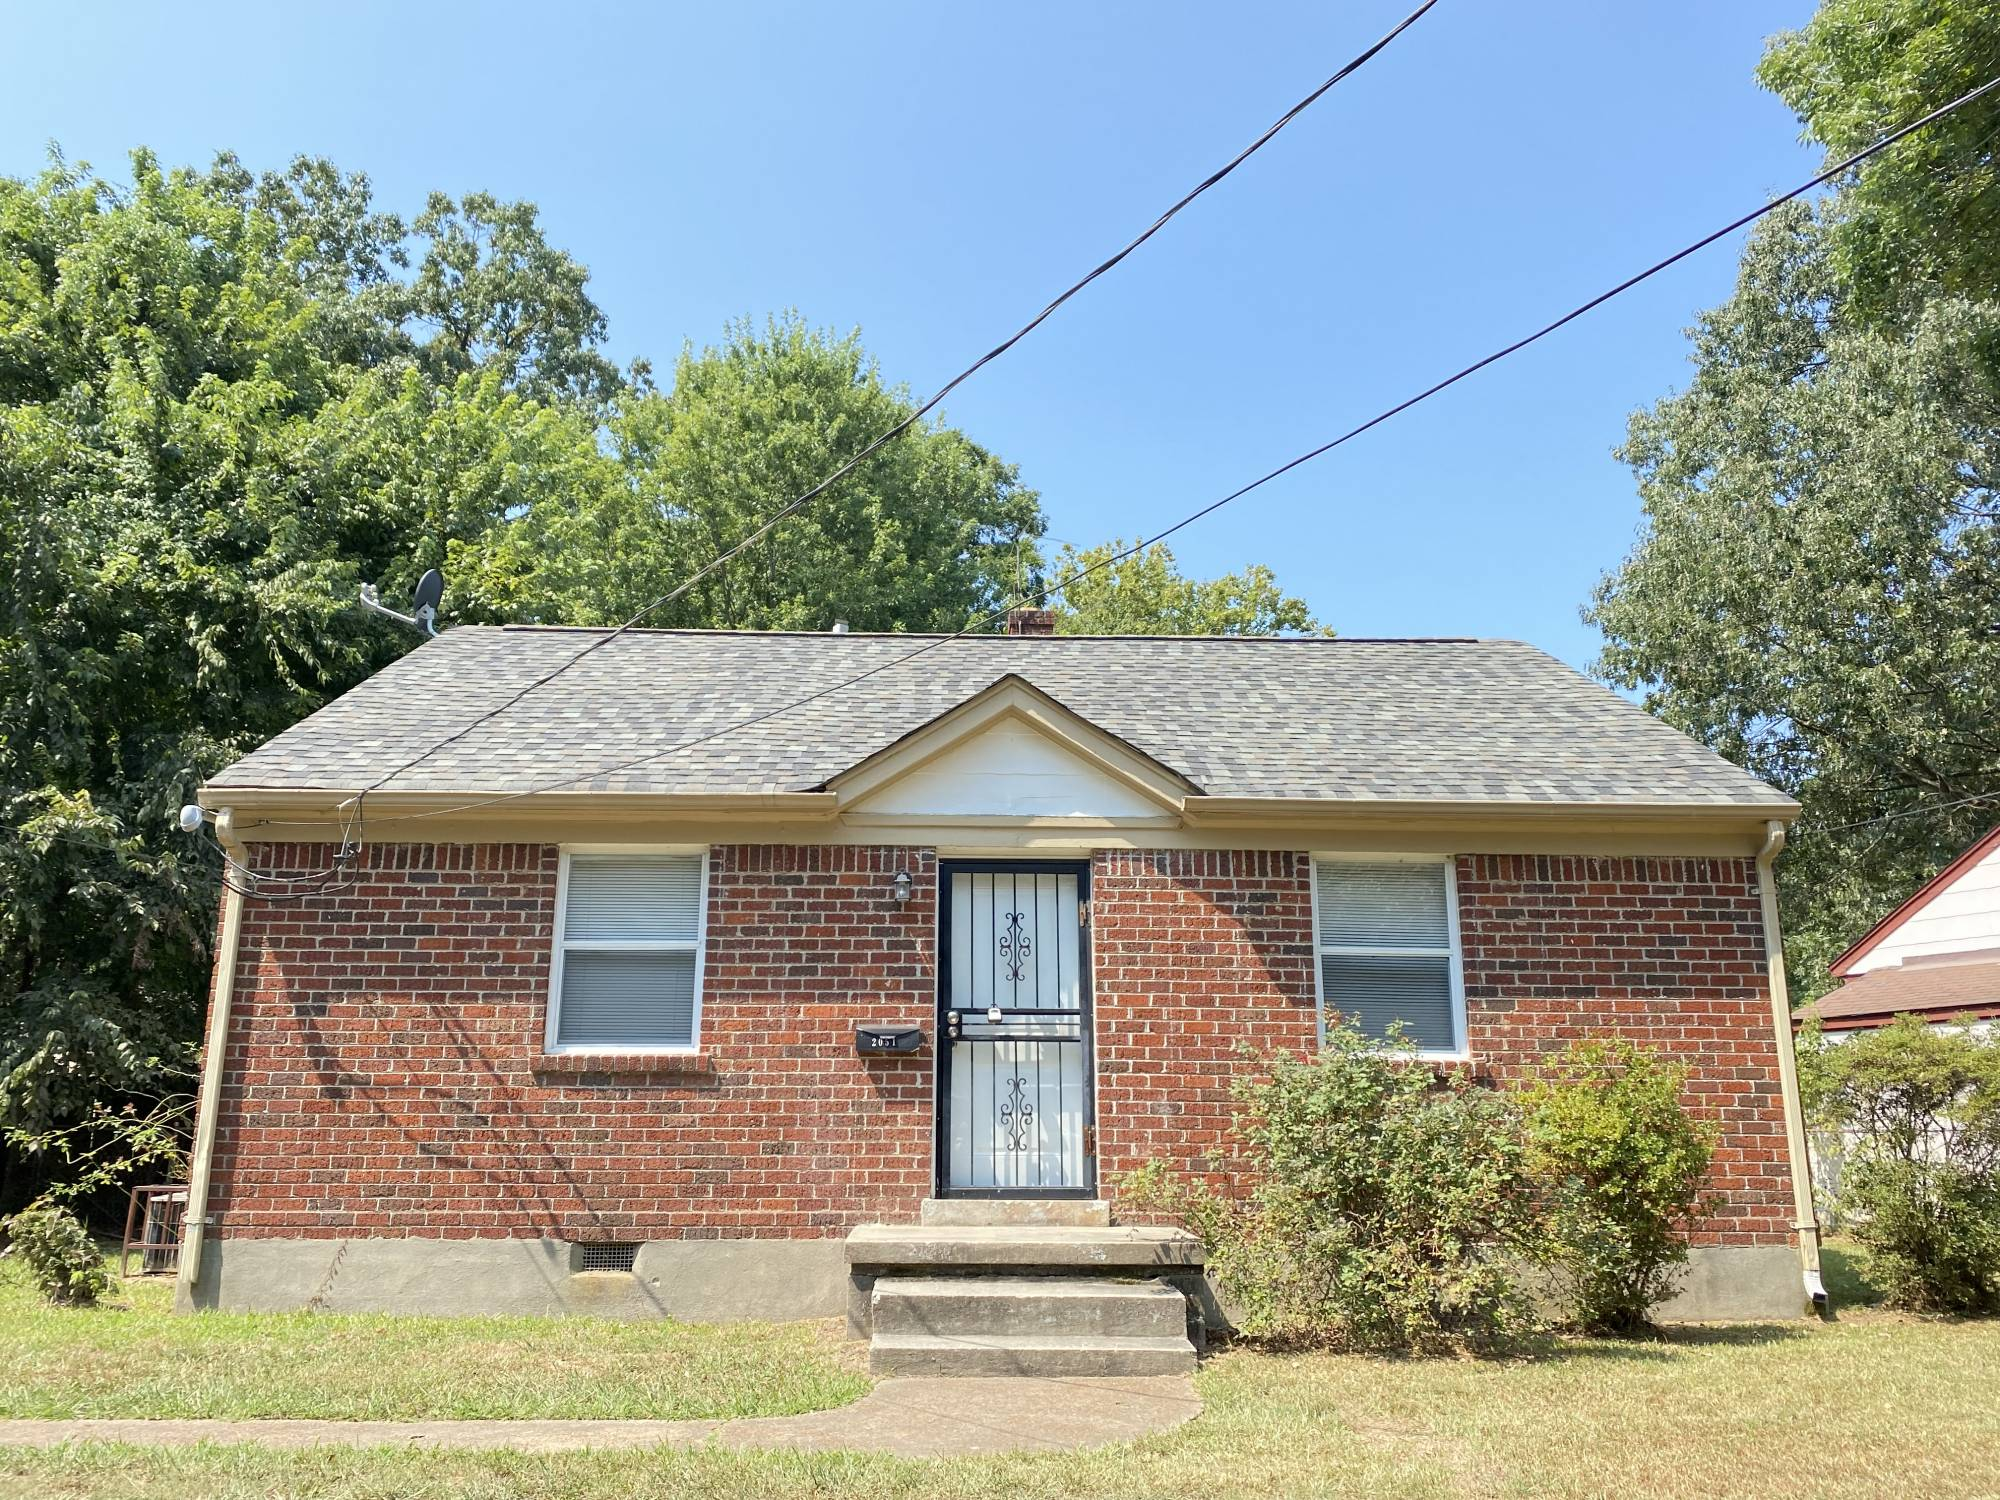 2051 Brookline Rd. Memphis TN 38128